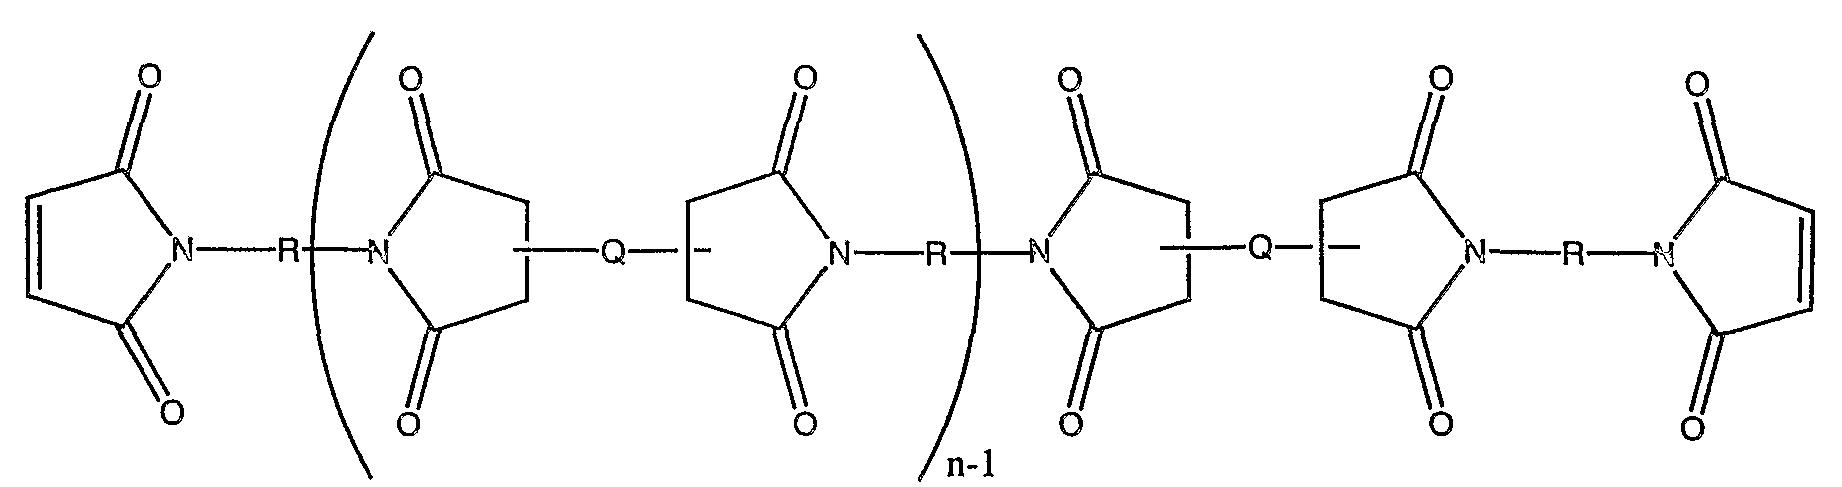 Figure 712012001903297-pct00027